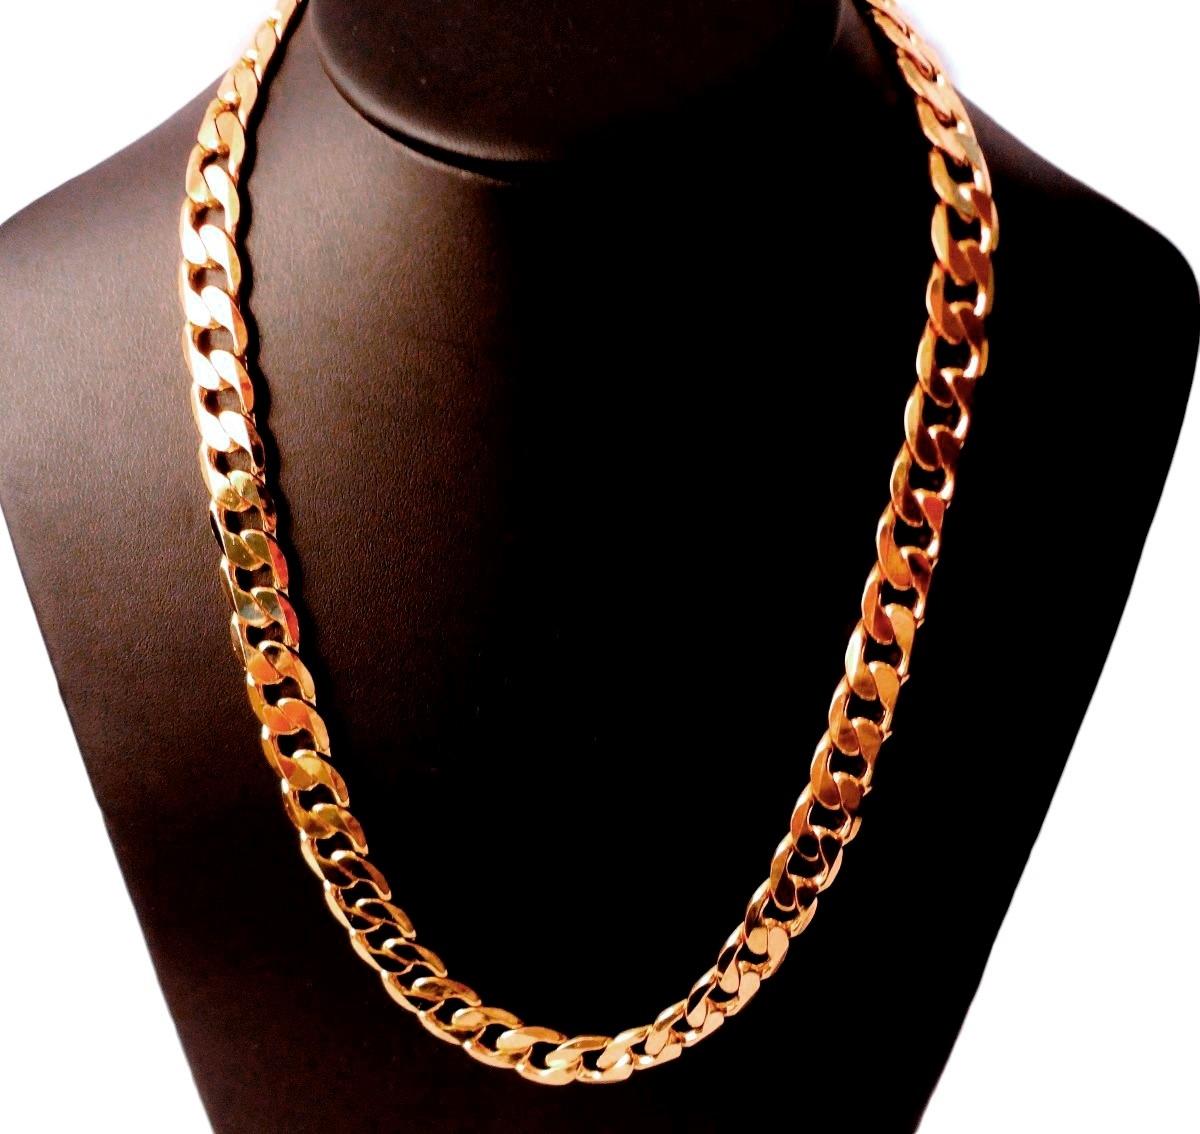 lo último f477b 75e13 Cadena Barbada De Oro Macizo 10k 65cm. Pesa 95grs Solid Gold